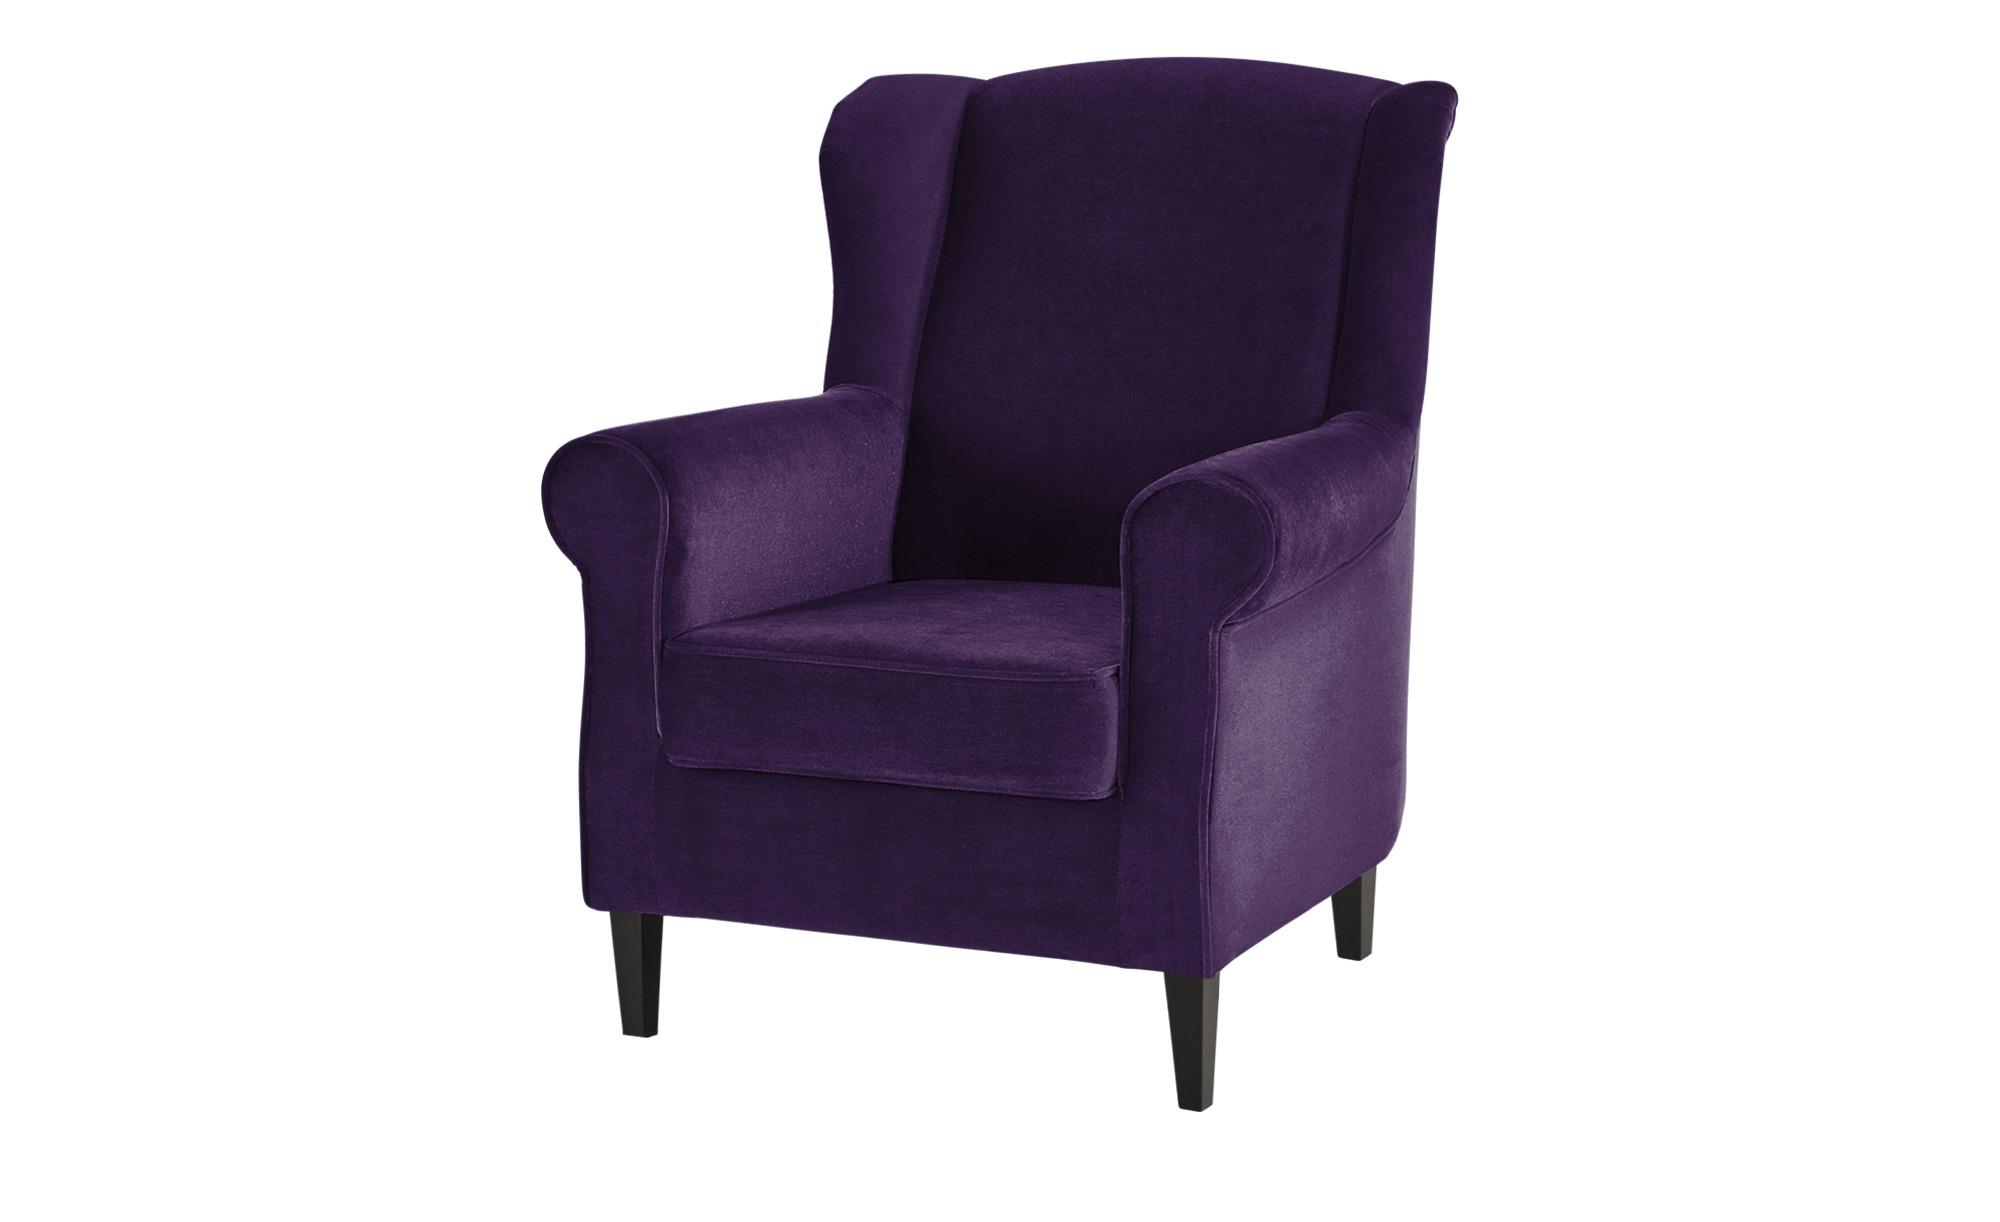 Ohrensessel  Britta ¦ lila/violett ¦ Maße (cm): B: 81 H: 100 T: 90 Polstermöbel > Sessel > Ohrensessel - Höffner